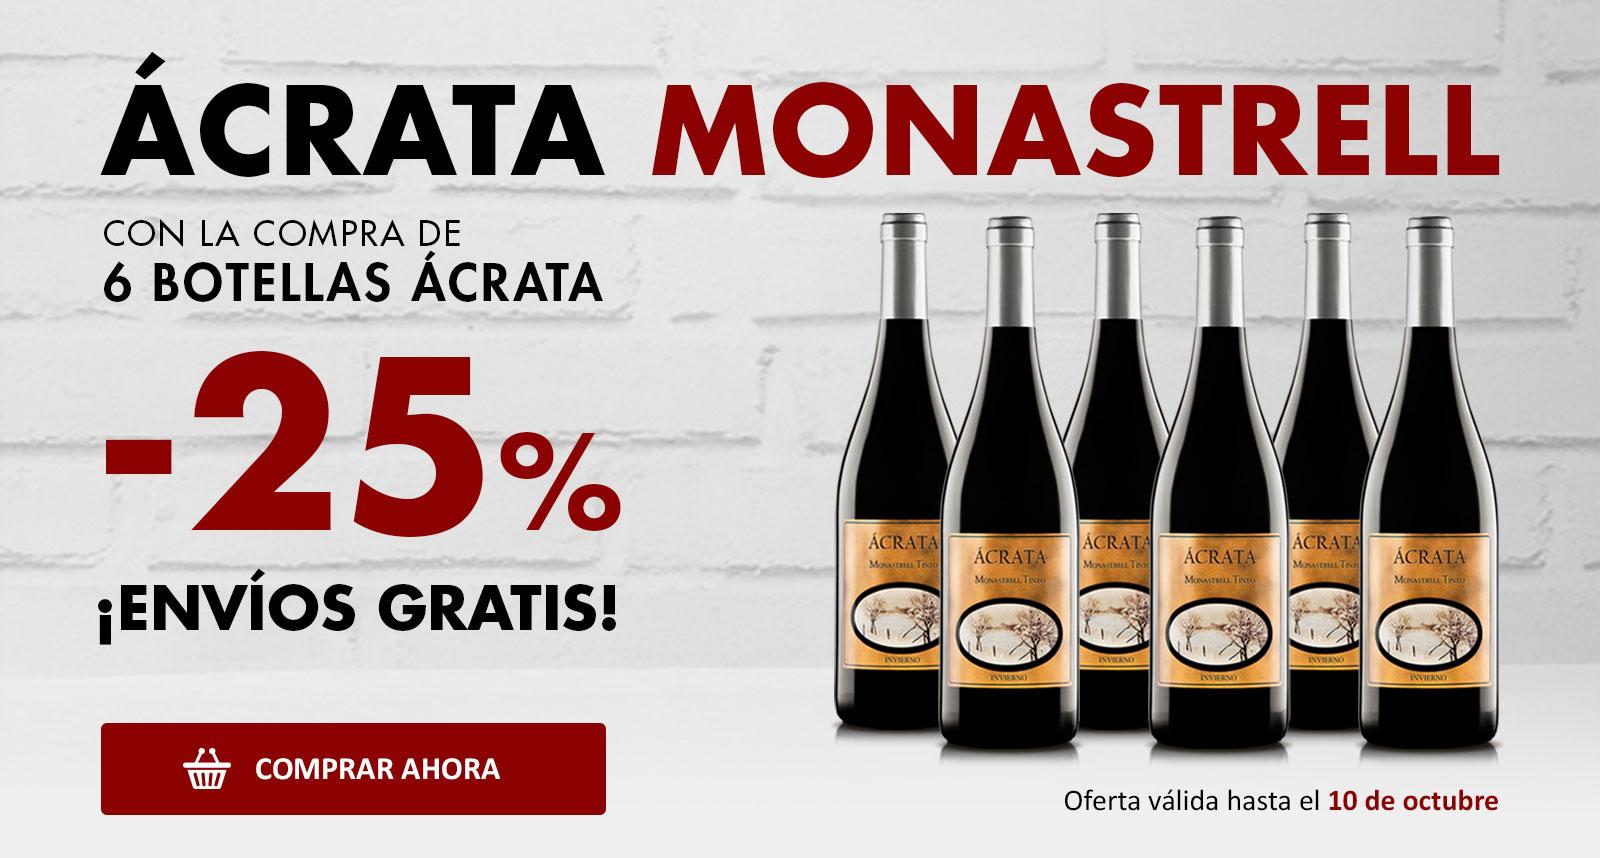 Kirios de Adrada   Ácrata Monastrel -25% Dto.